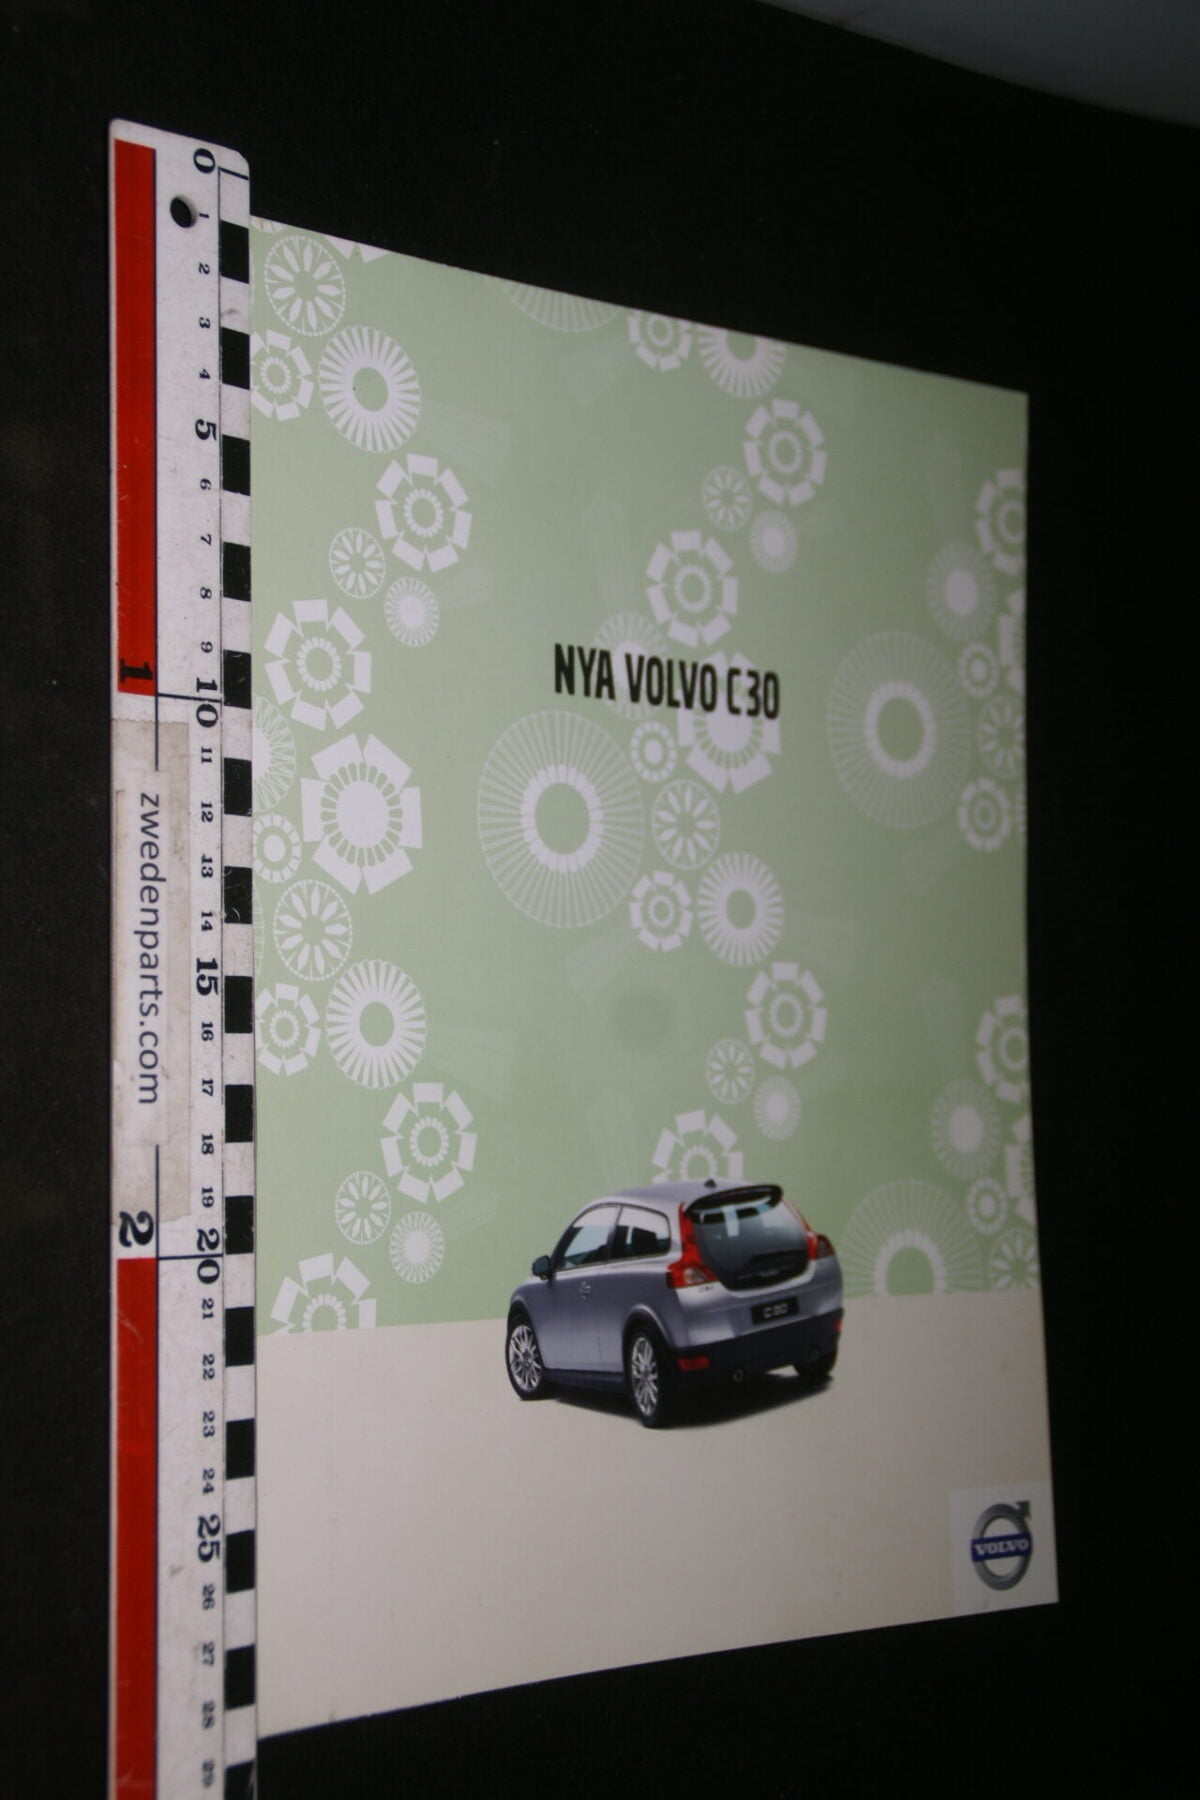 DSC04440 2006 brochure Volvo C30 nr. VBPV 14-07, Svenska-b0d00906